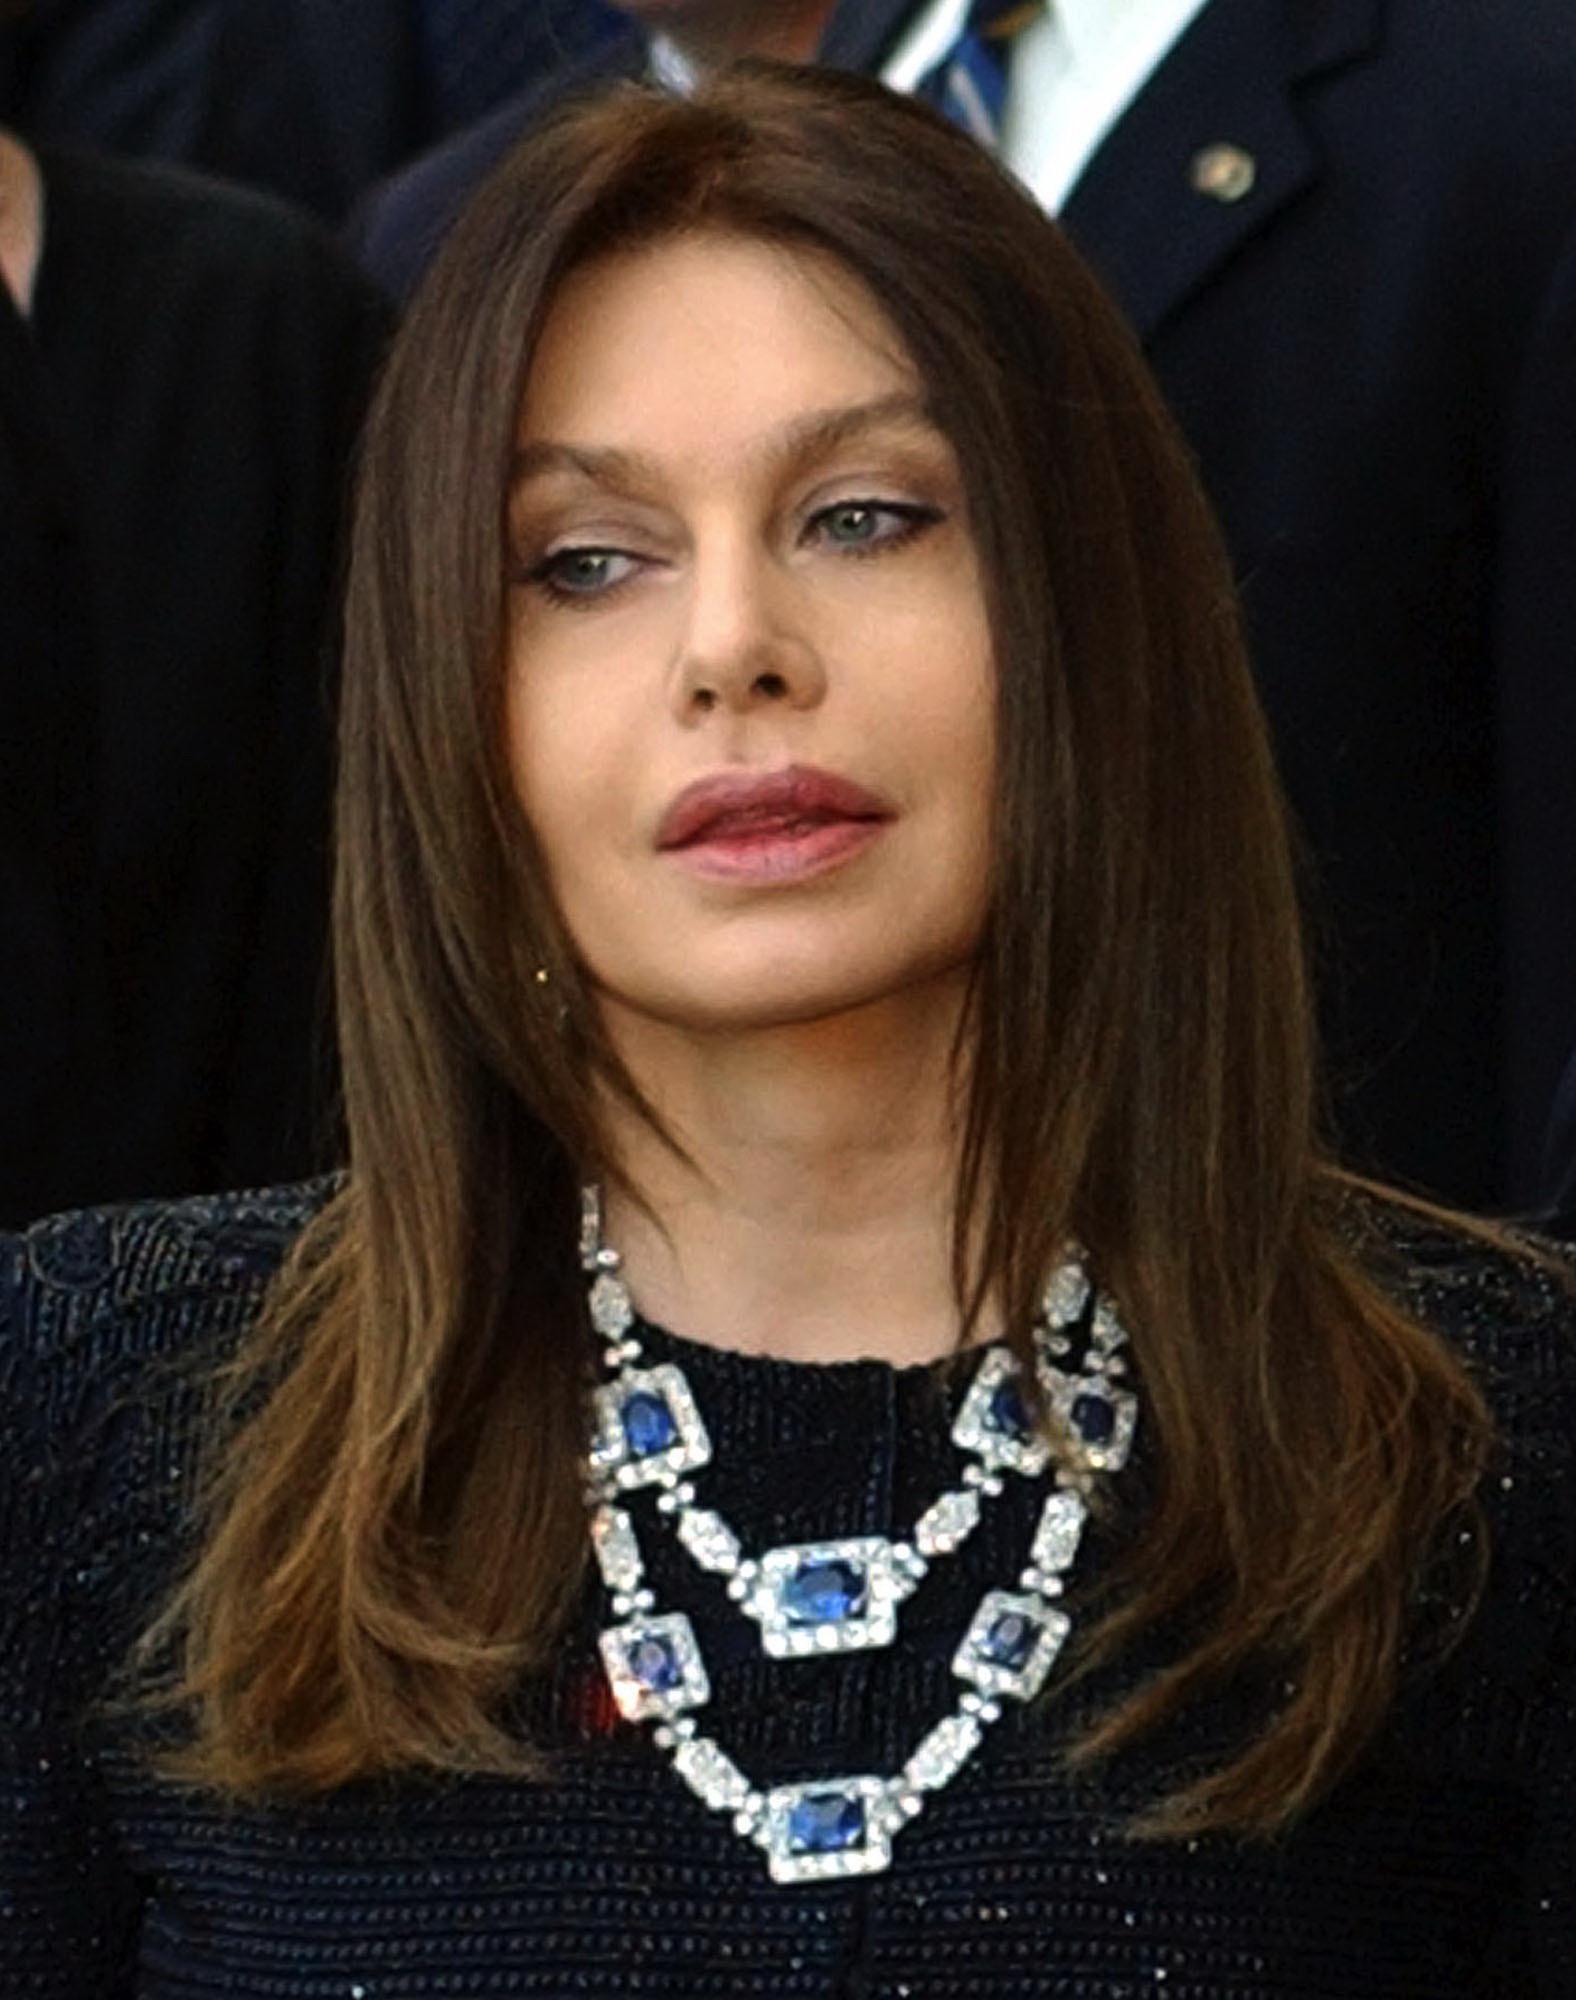 This June 2004 file photo shows Veronica Lario, wife of Italian Premier Silvio Berlusconi, at Rome's Villa Madama on the occasion of the visit of U.S....